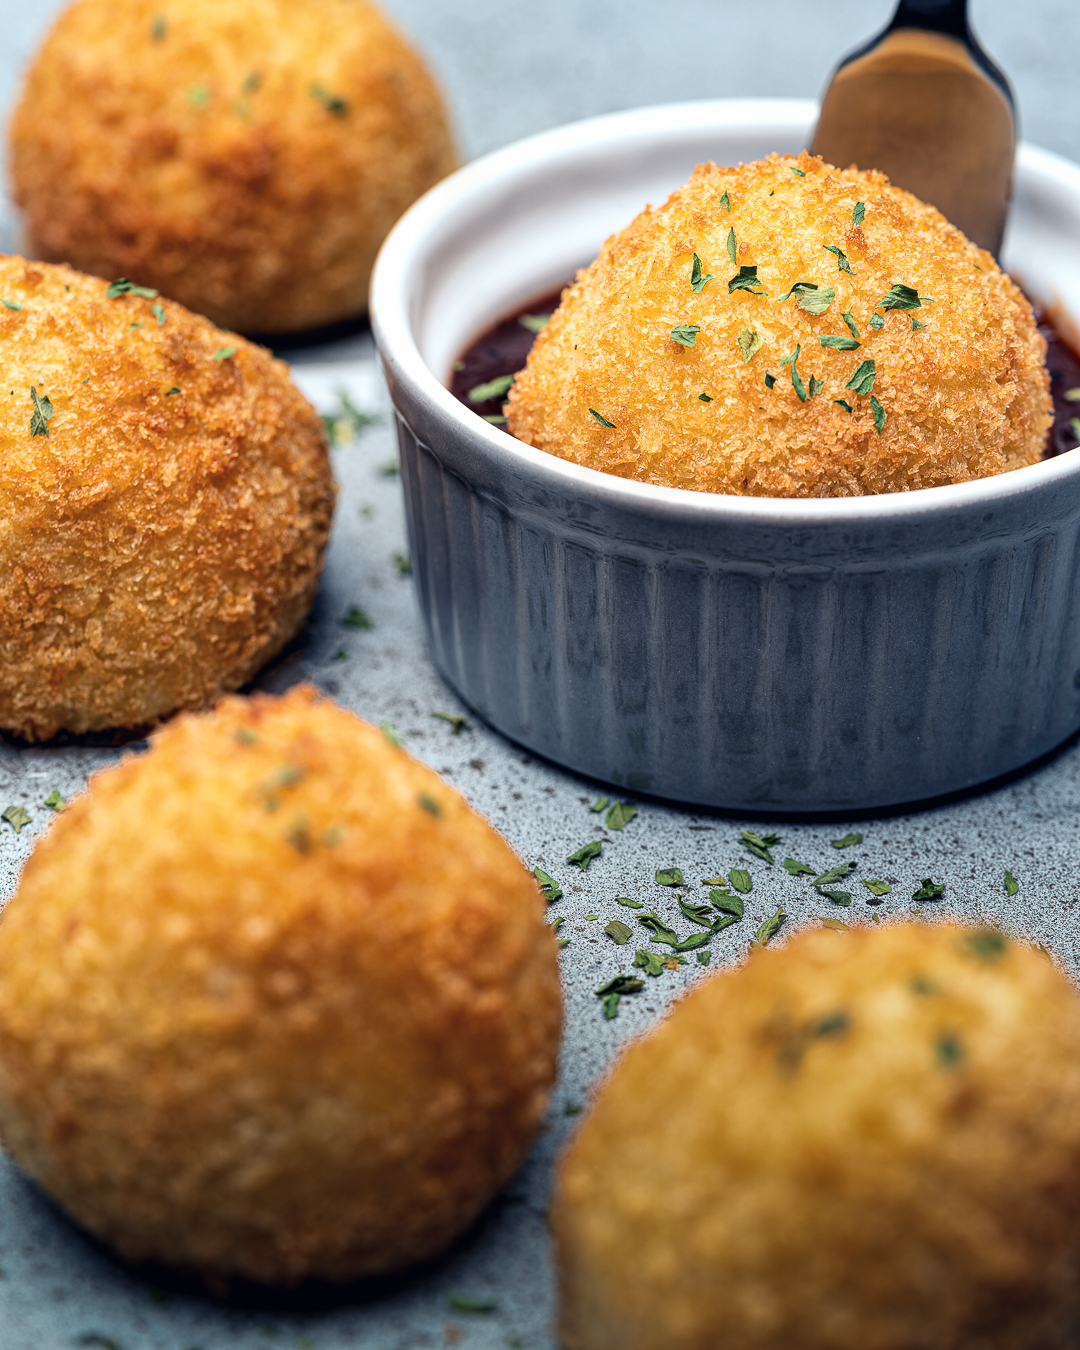 Porto_s Bakery Potato Balls-0001-Brian Suman Photography.jpg